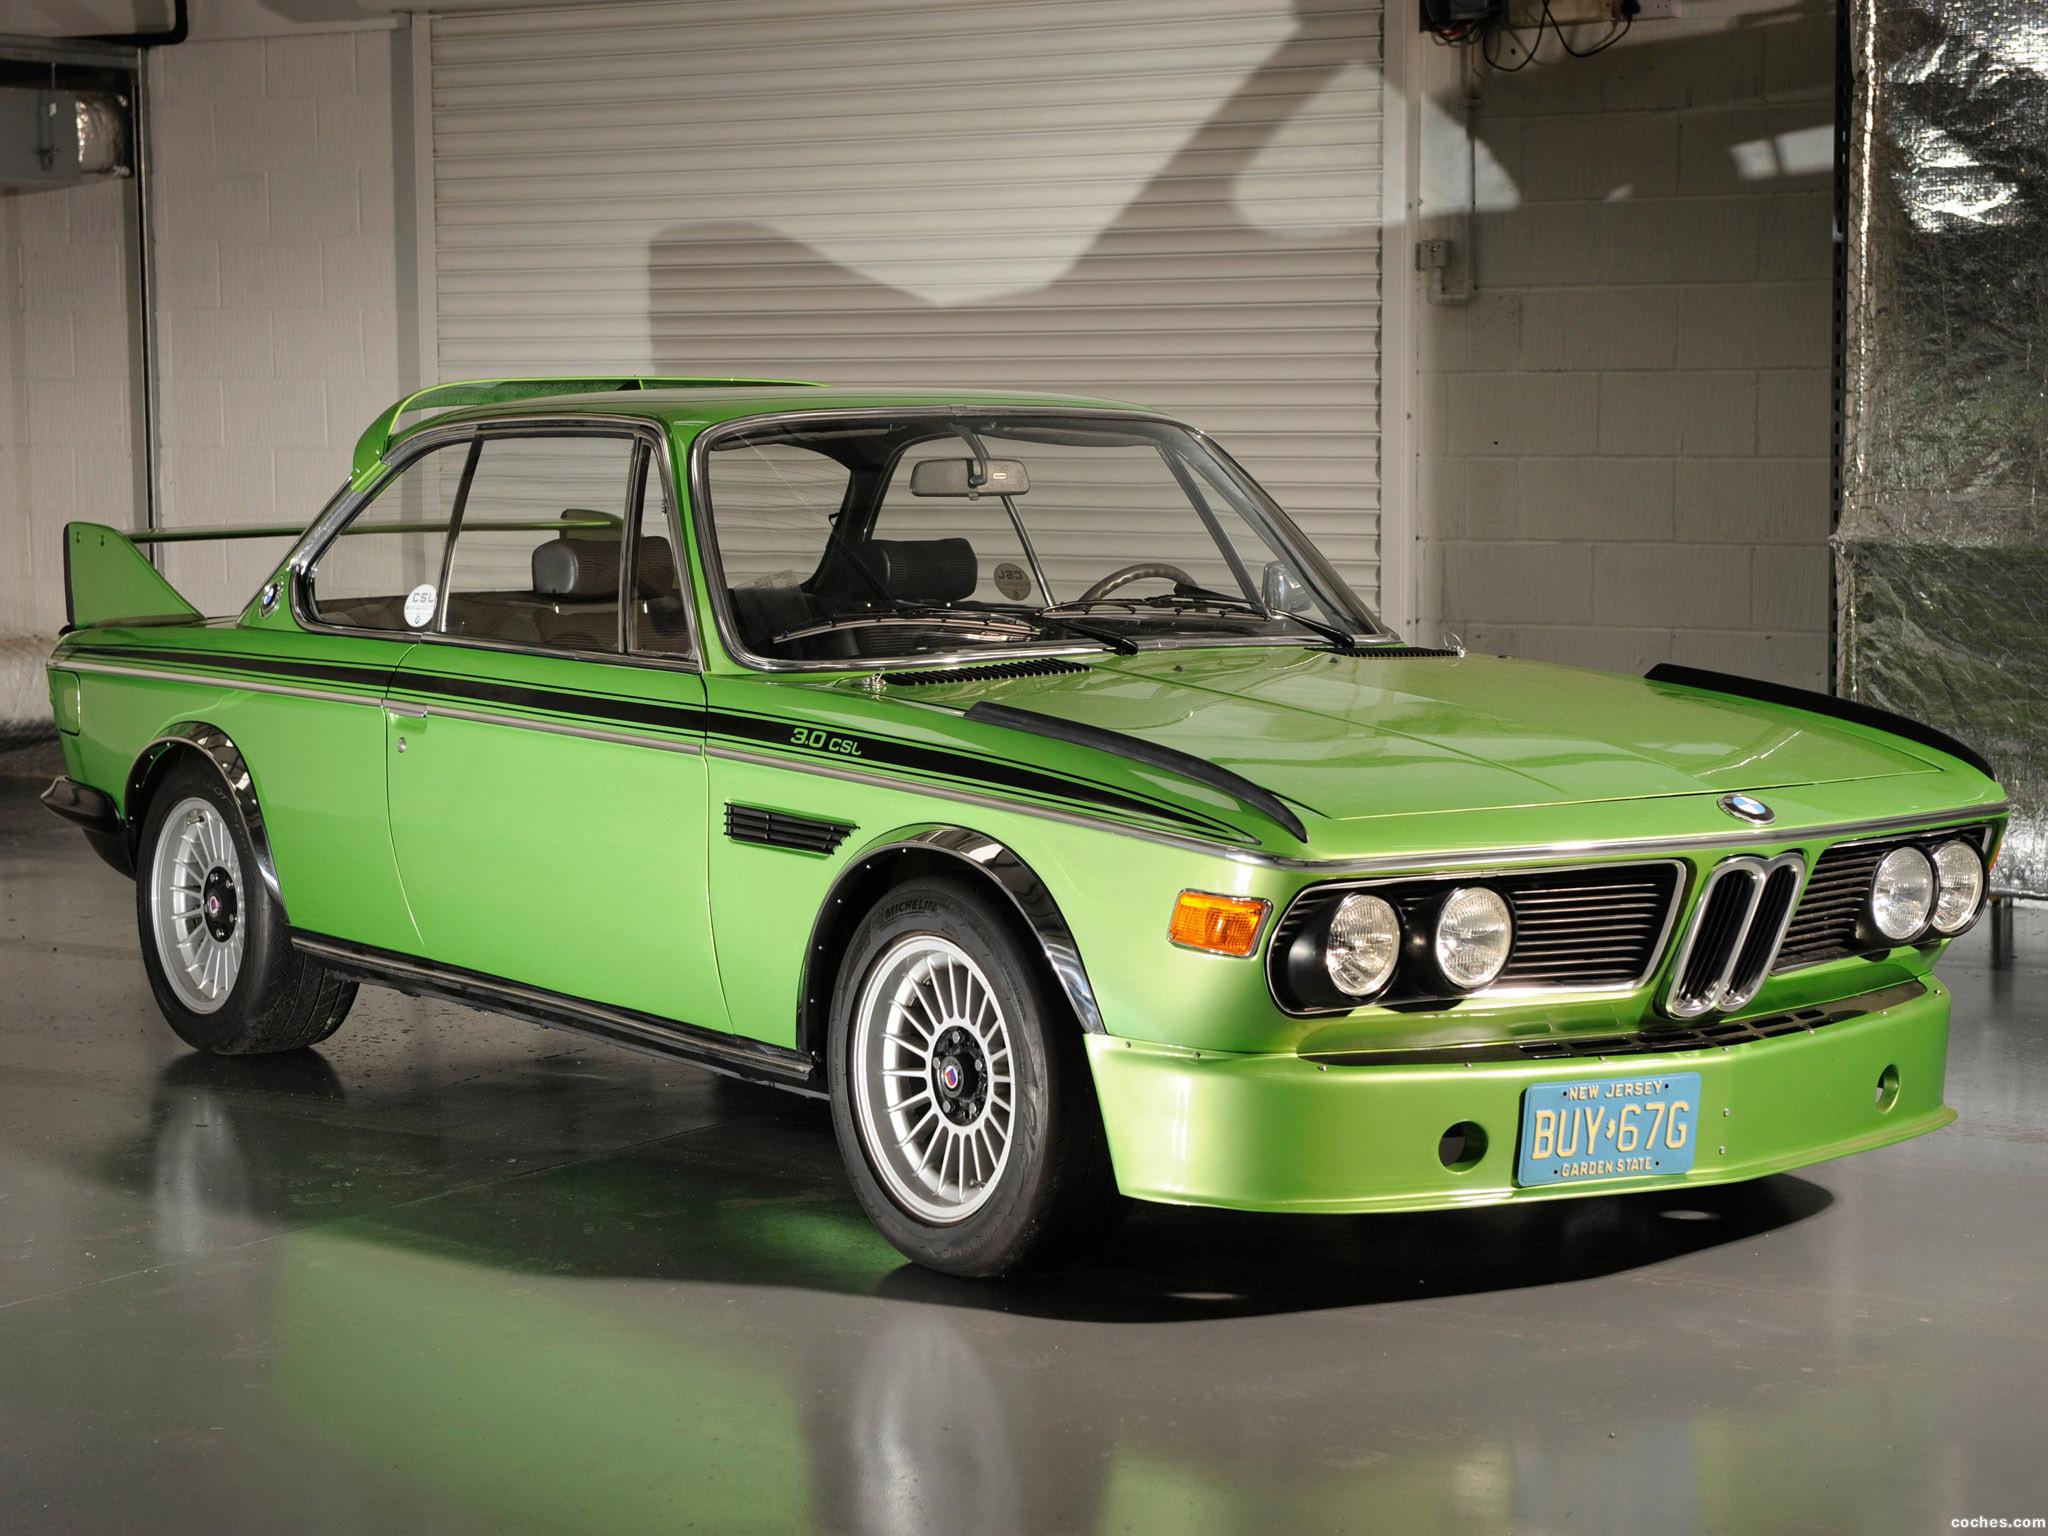 BMW 30 CSL vintage model car